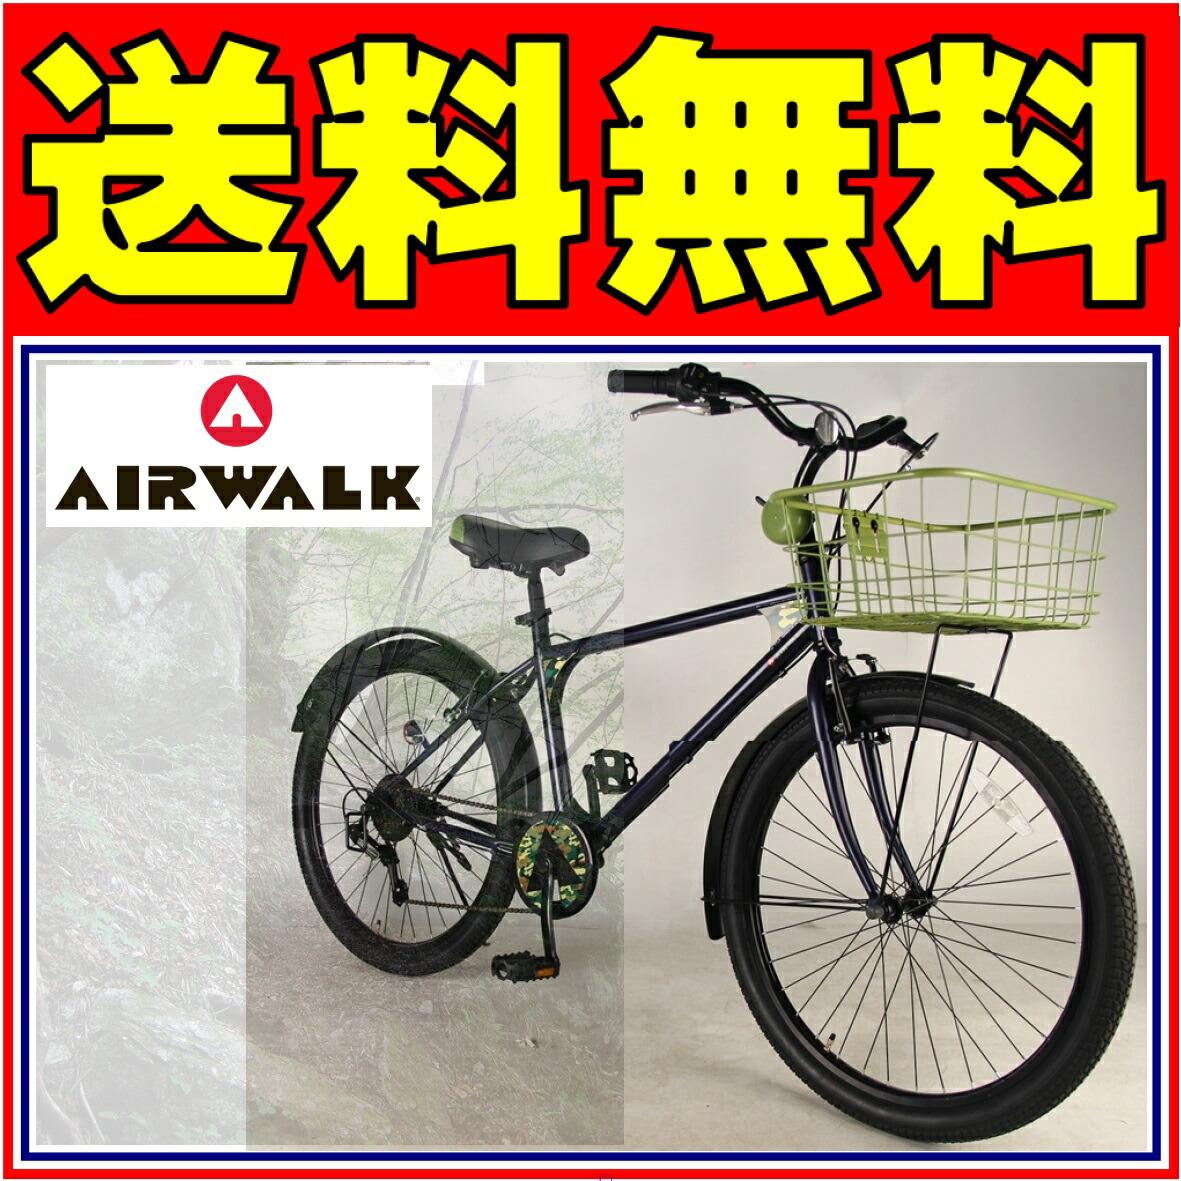 AIRWALK 自転車 ファットバイク ネイビー 紺 街乗りに最適 MTB/BMX 26インチ 外装6段 ファットバイクAIRWALK エアーウォーク 自転車